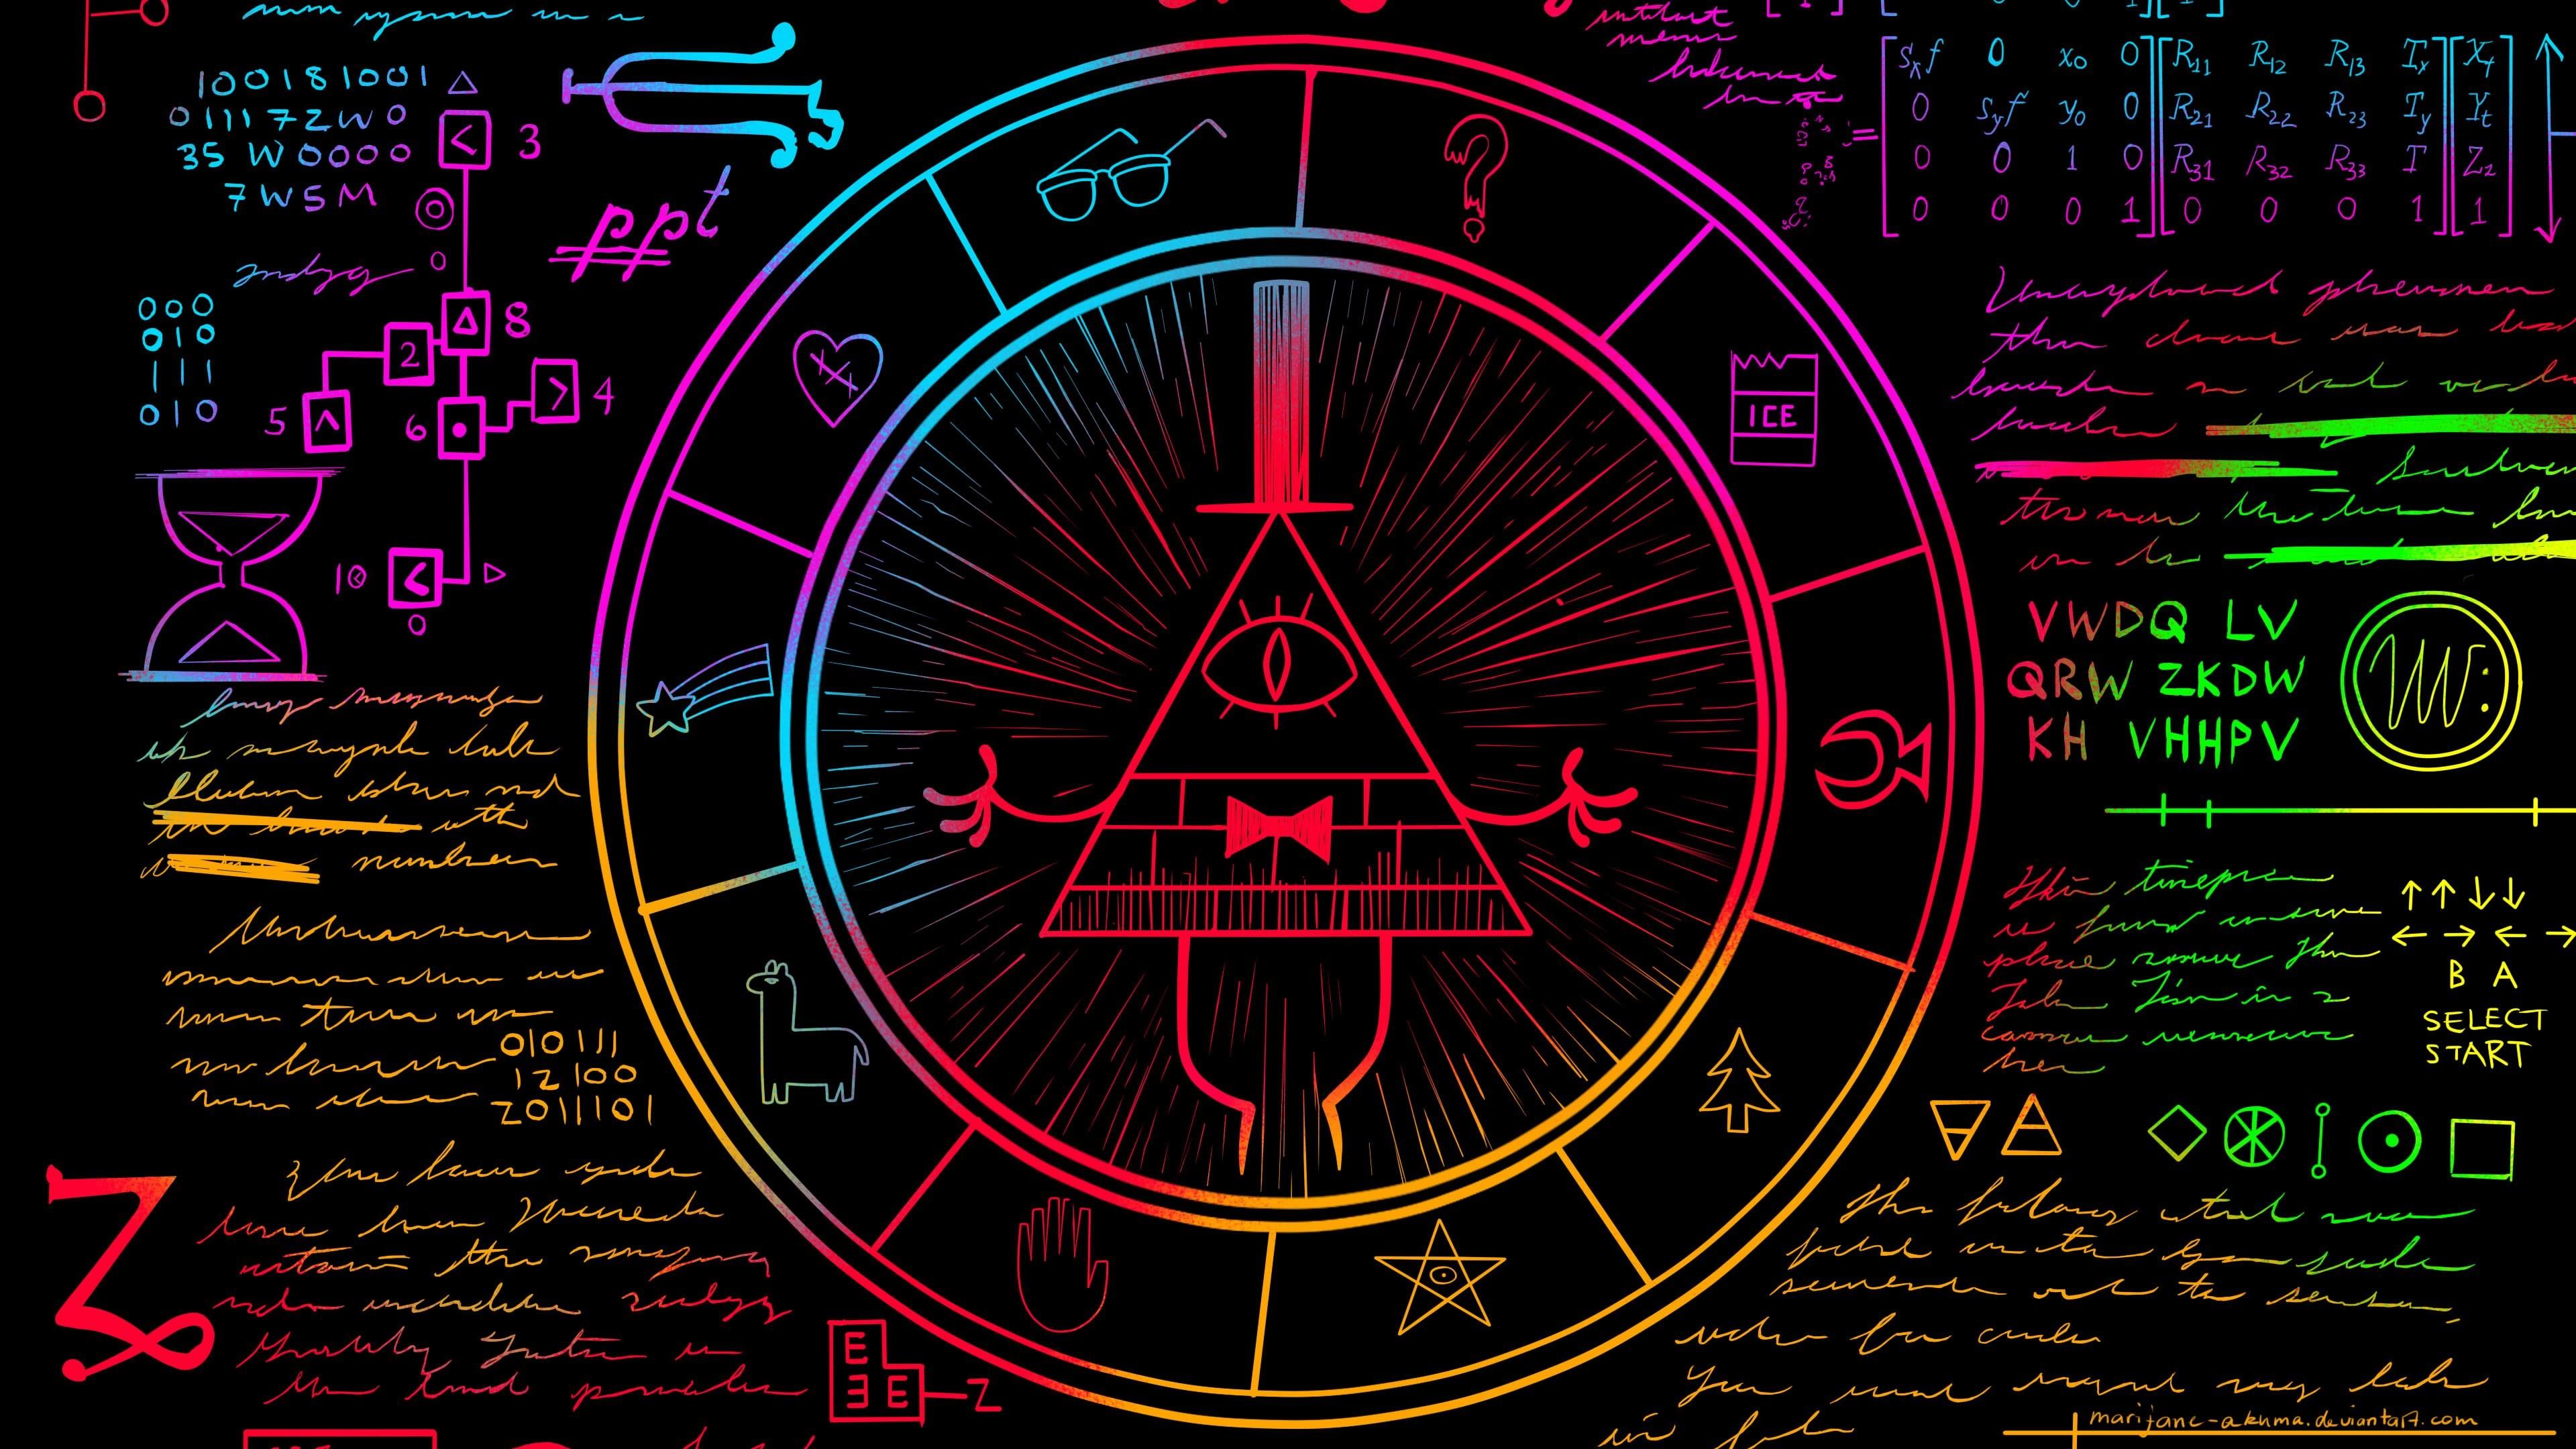 Gravity Falls Bill Cipher Wallpaper 80 images 3840x2160